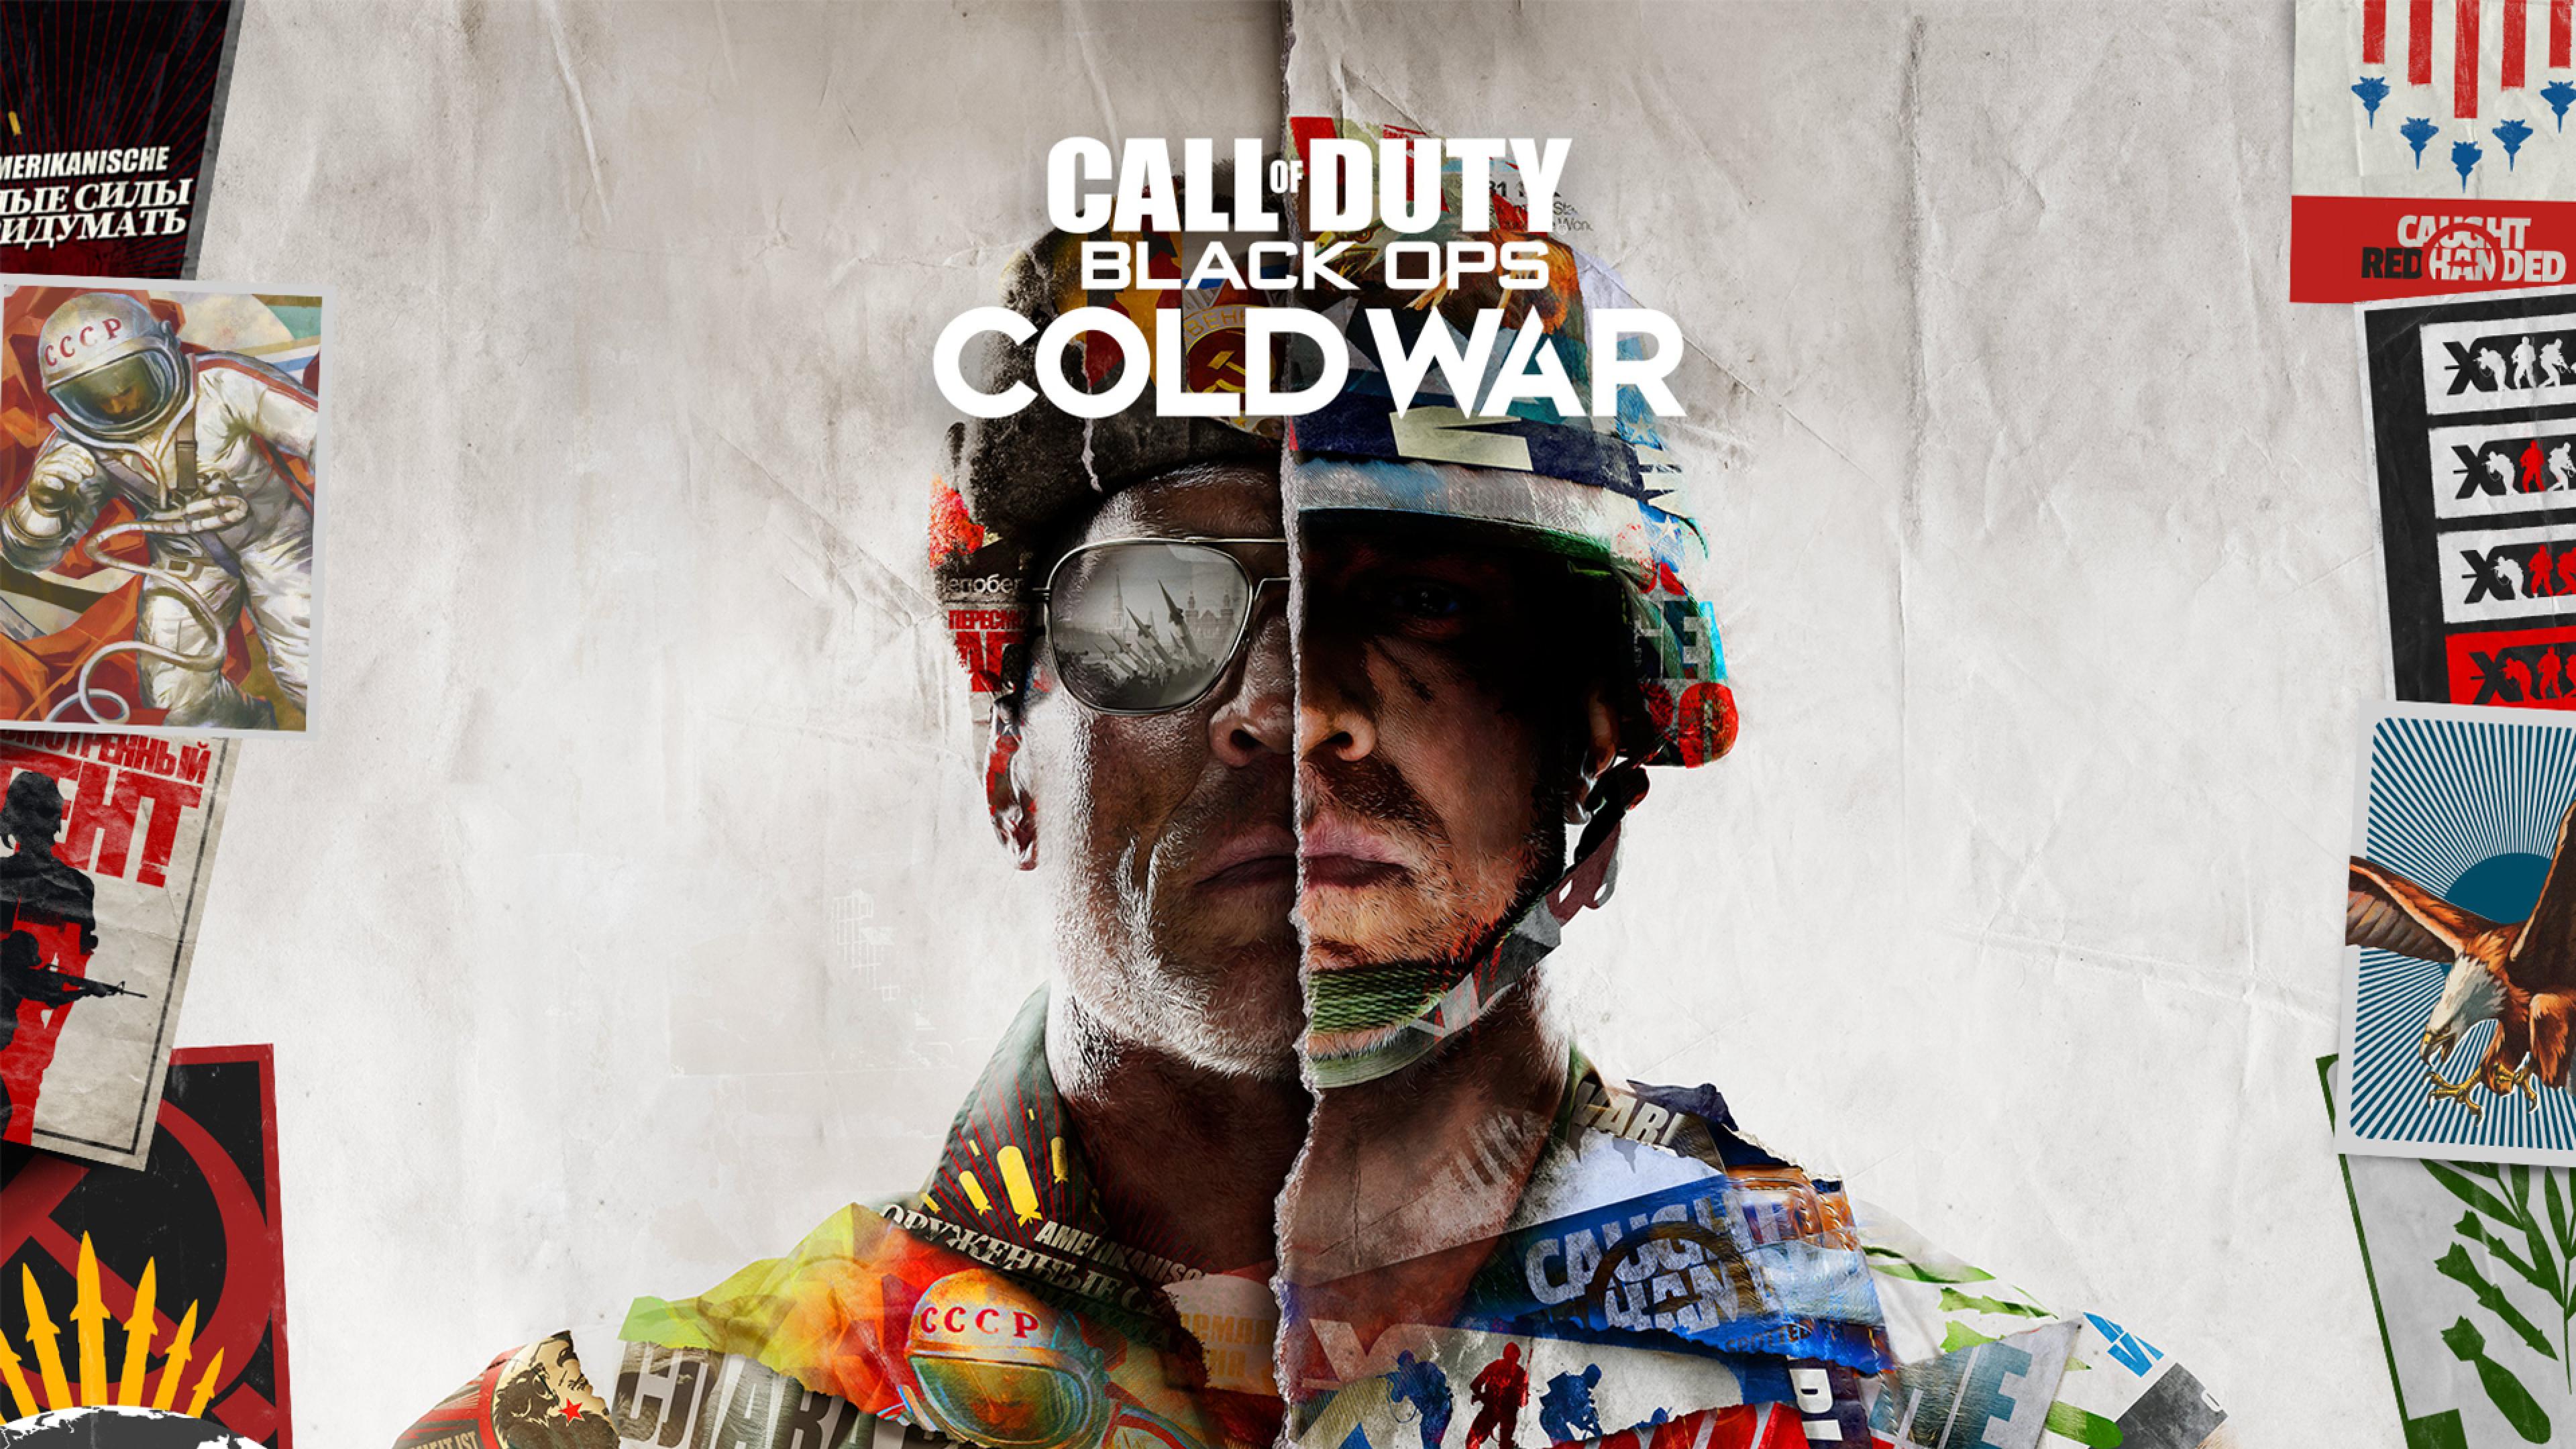 3840x2160 Call of Duty Black Ops Cold War 4K Wallpaper, HD ...